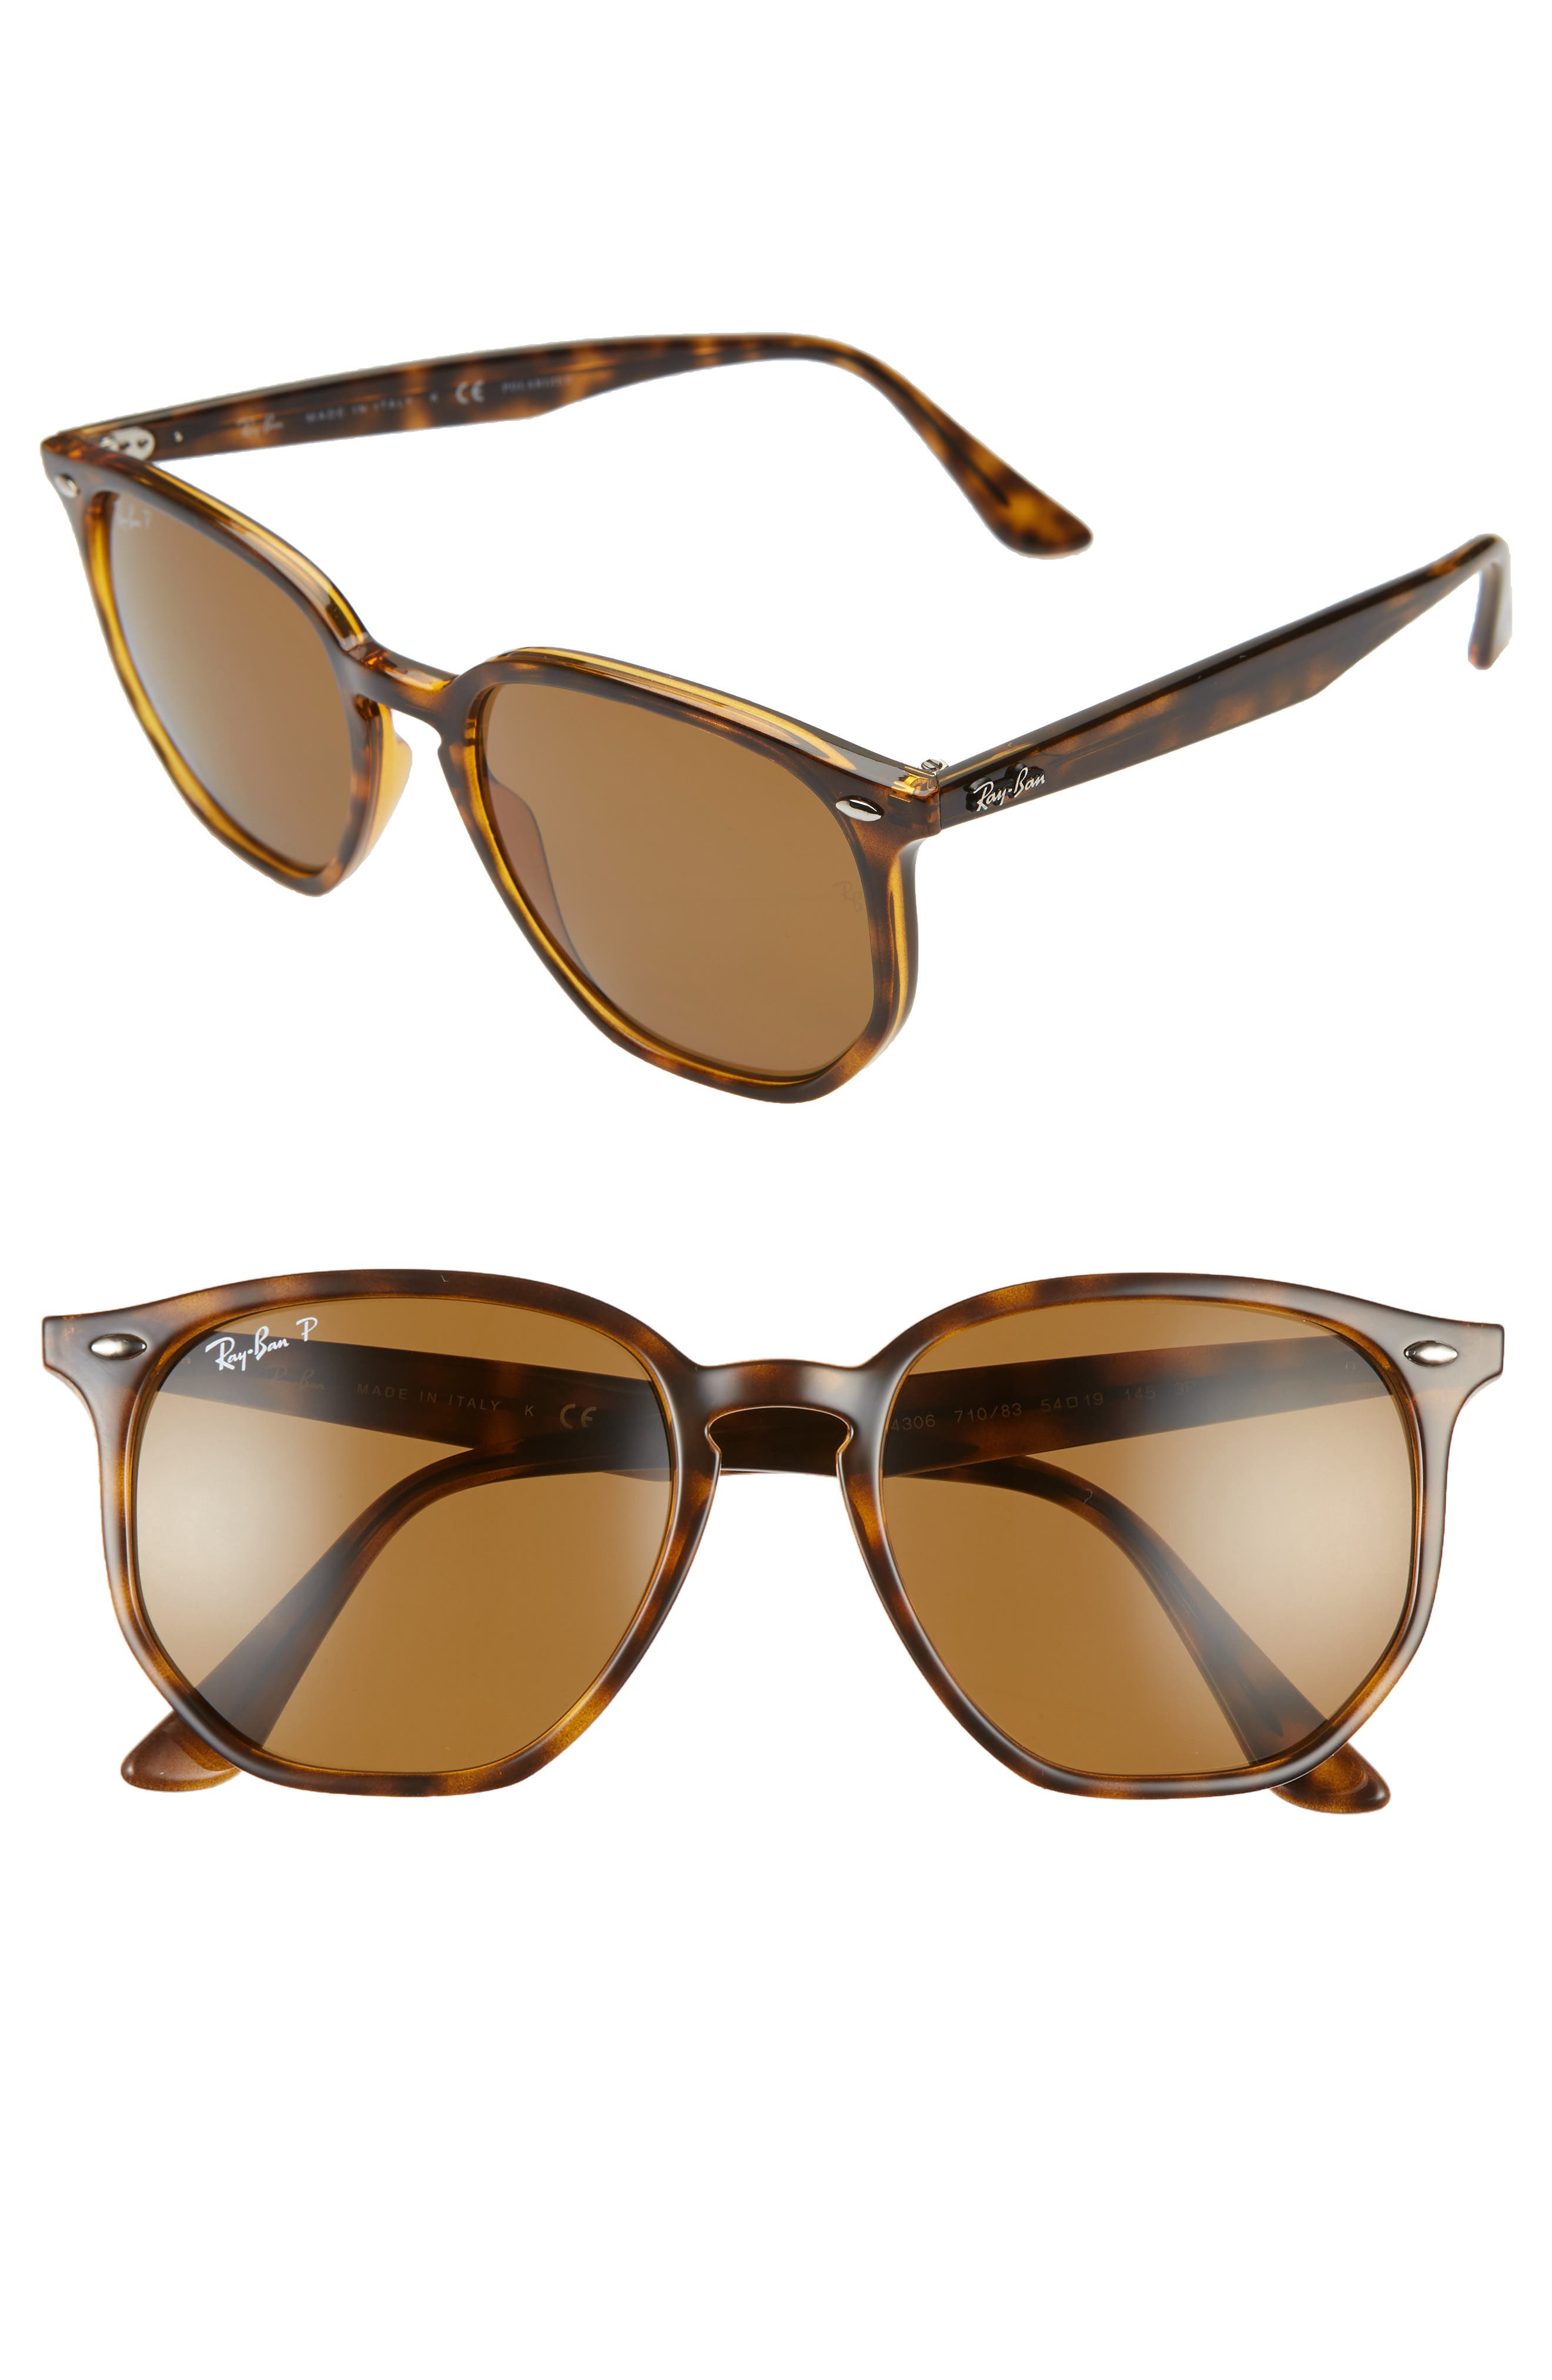 Ray-Ban 5m Polarized Round Sunglasses - Havana/ Brown Solid